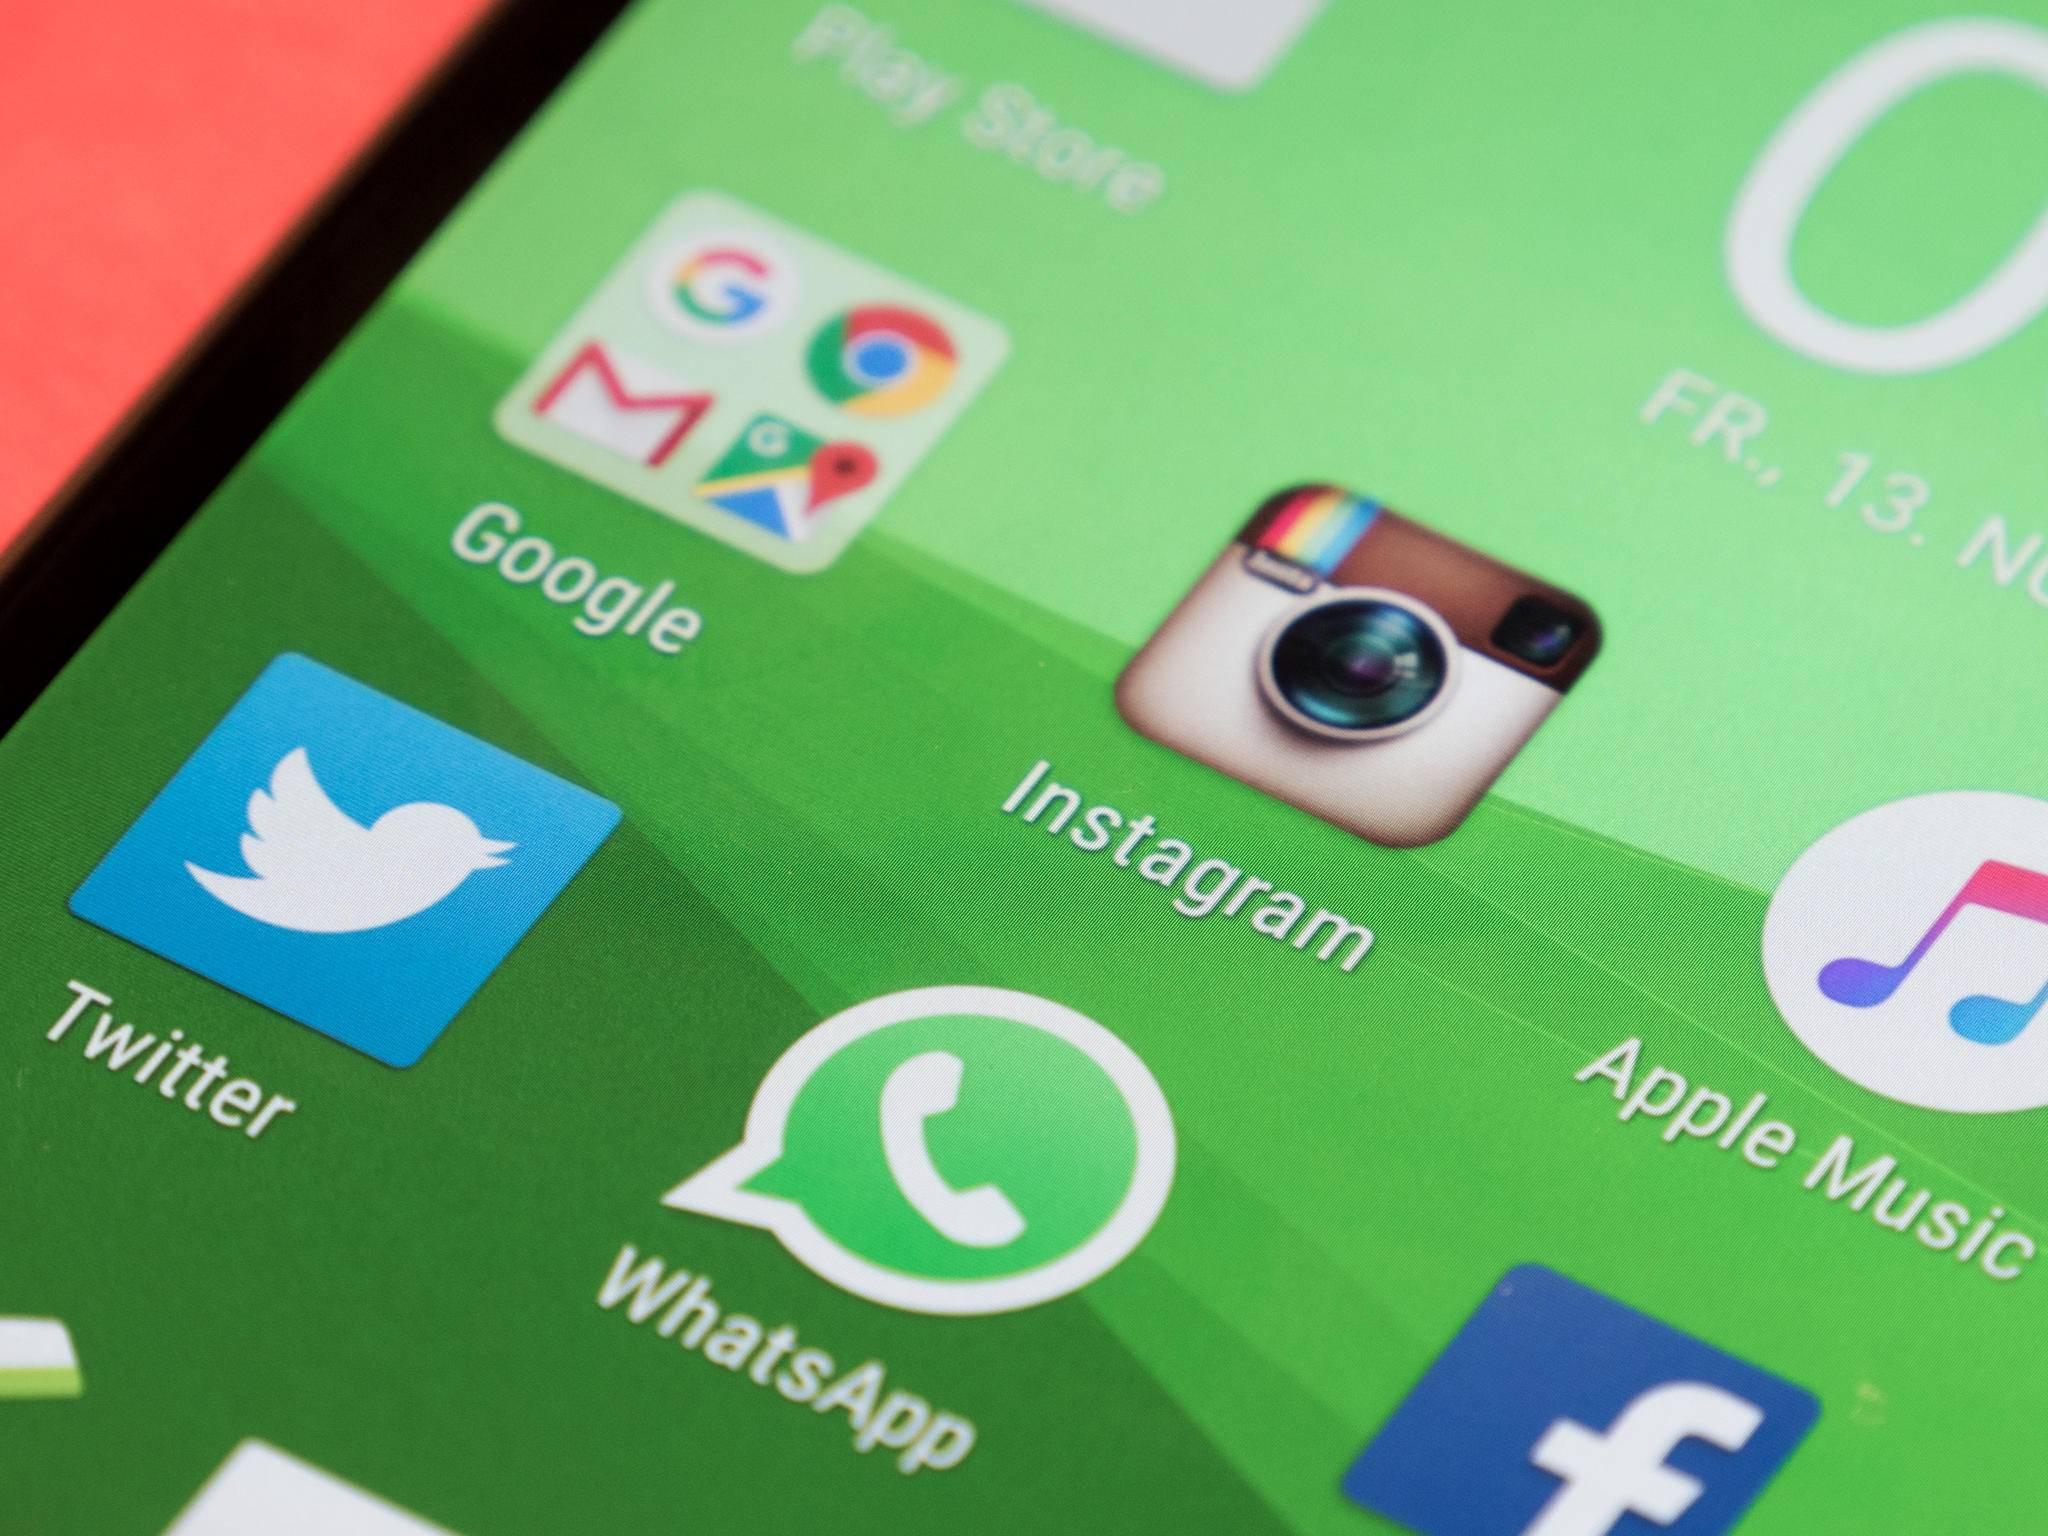 Instagram, Apple Music, Twitter, WhatsApp